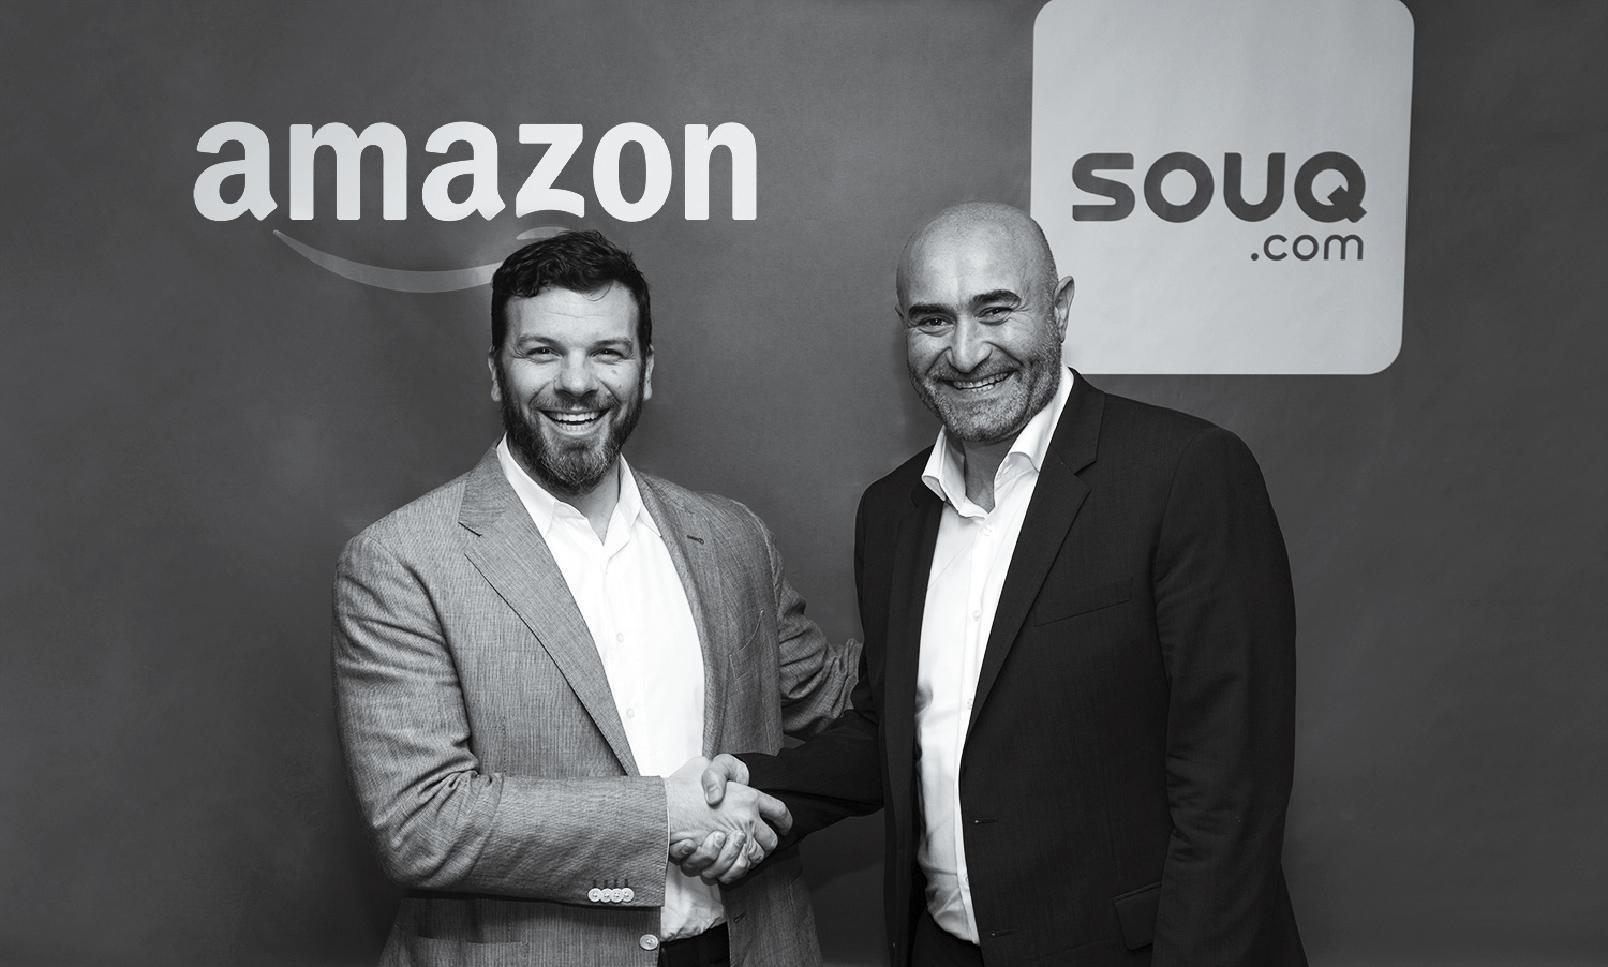 El ejecutivo del Amazonas Russ Grandinetti (izquierda) estrecha la mano de Ronaldo Mouchawar, fundador de Souq.com.